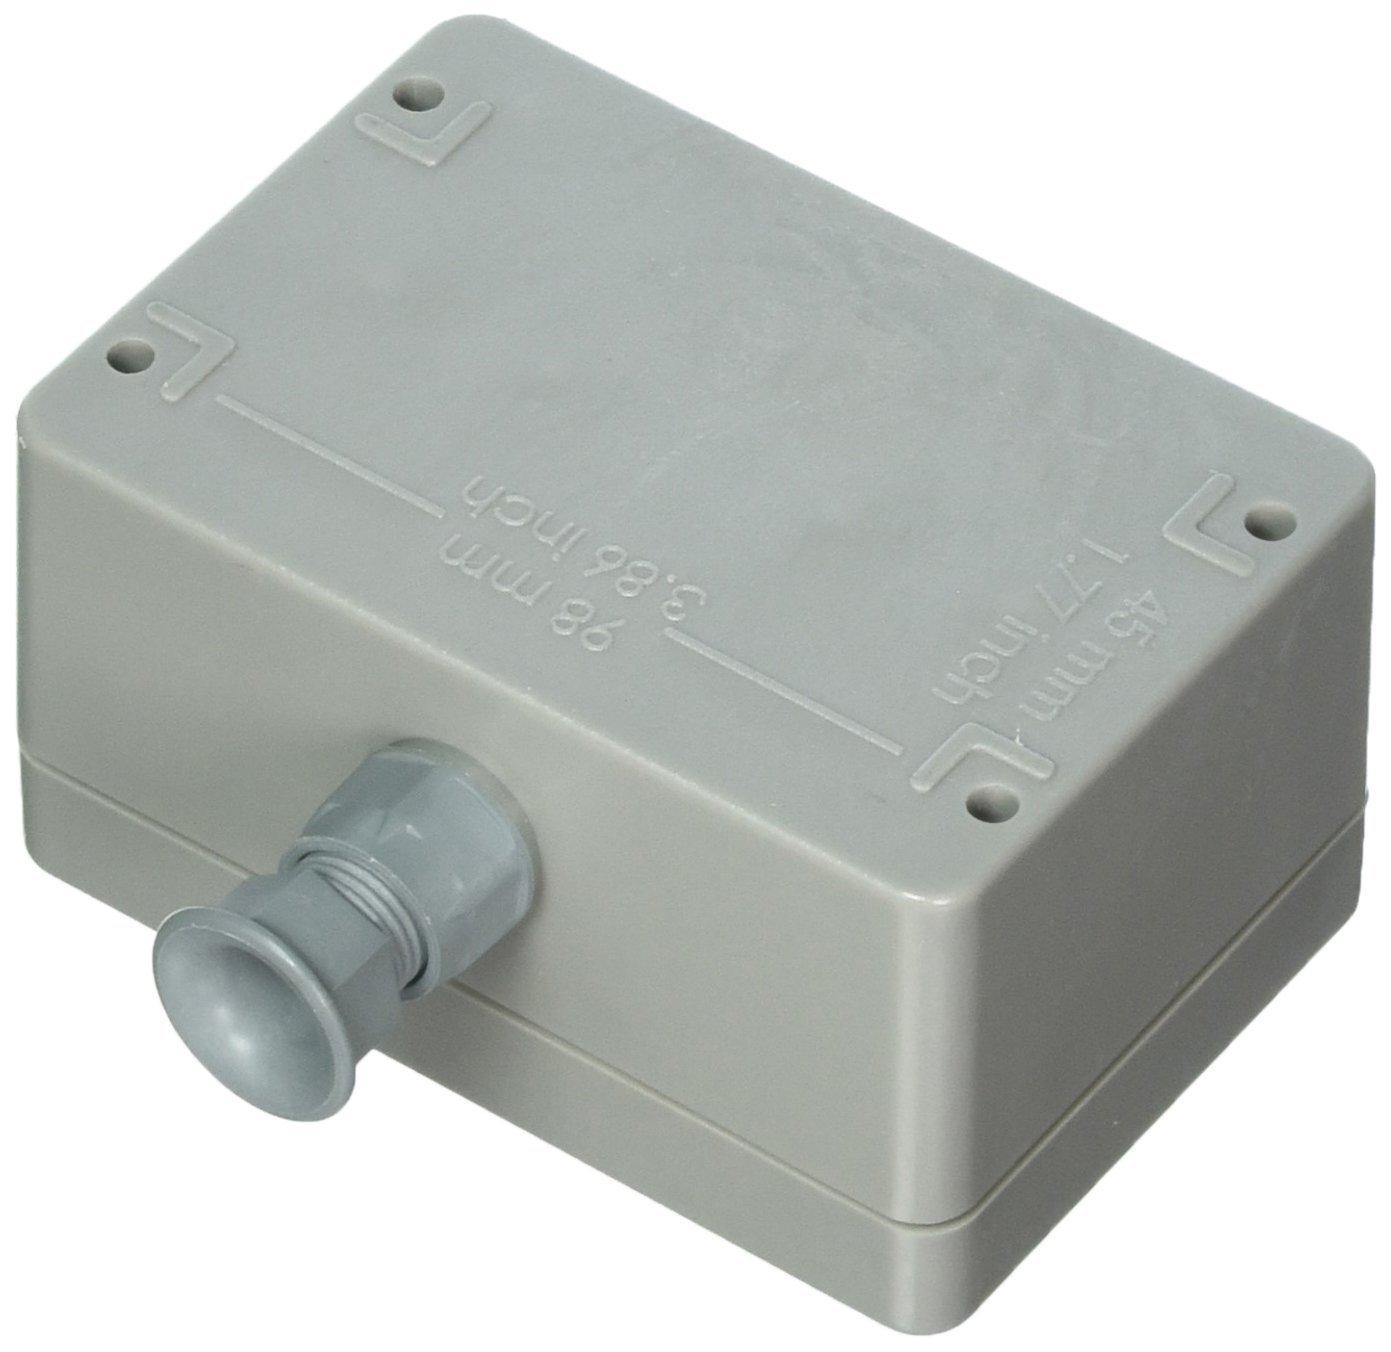 Linear MegaCode Gate Safety Edge Transmitter (DNT00068)